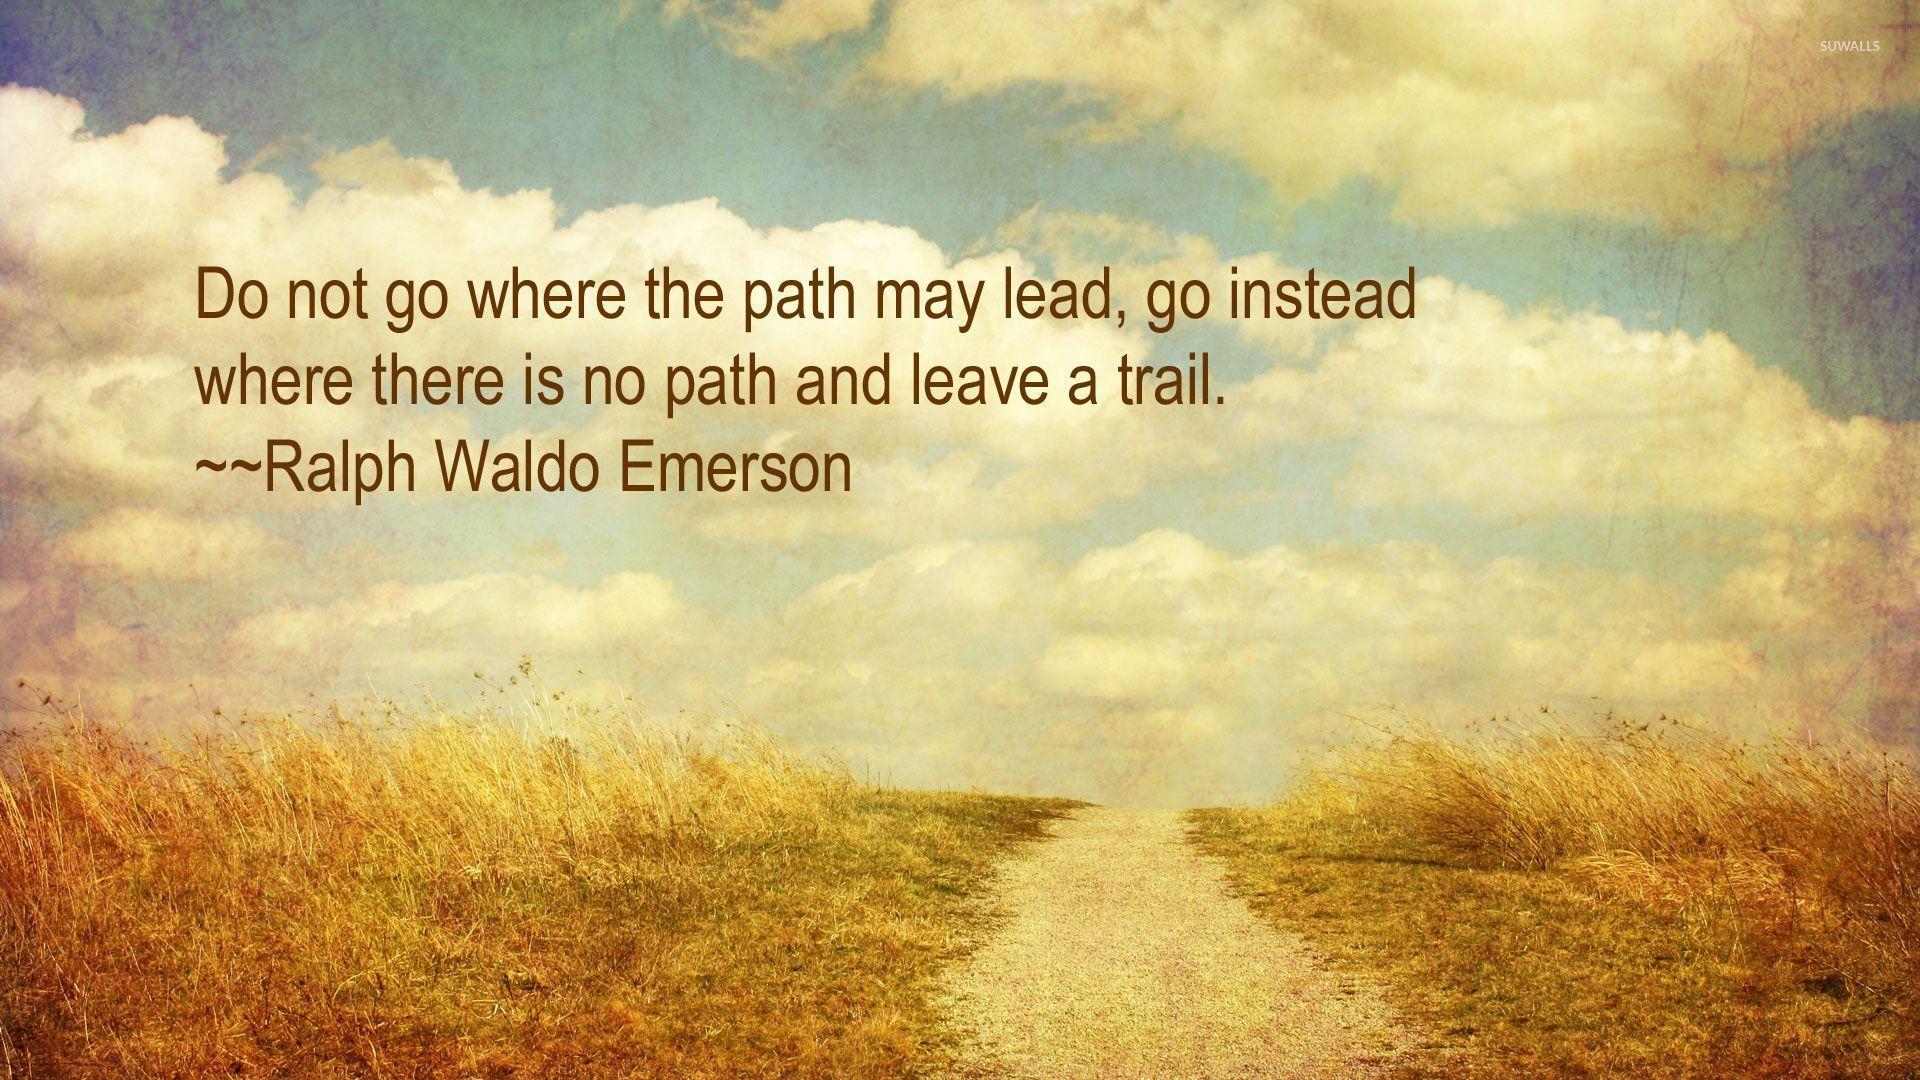 Ralph Waldo Emerson Quote Wallpaper Quote Wallpapers 31428